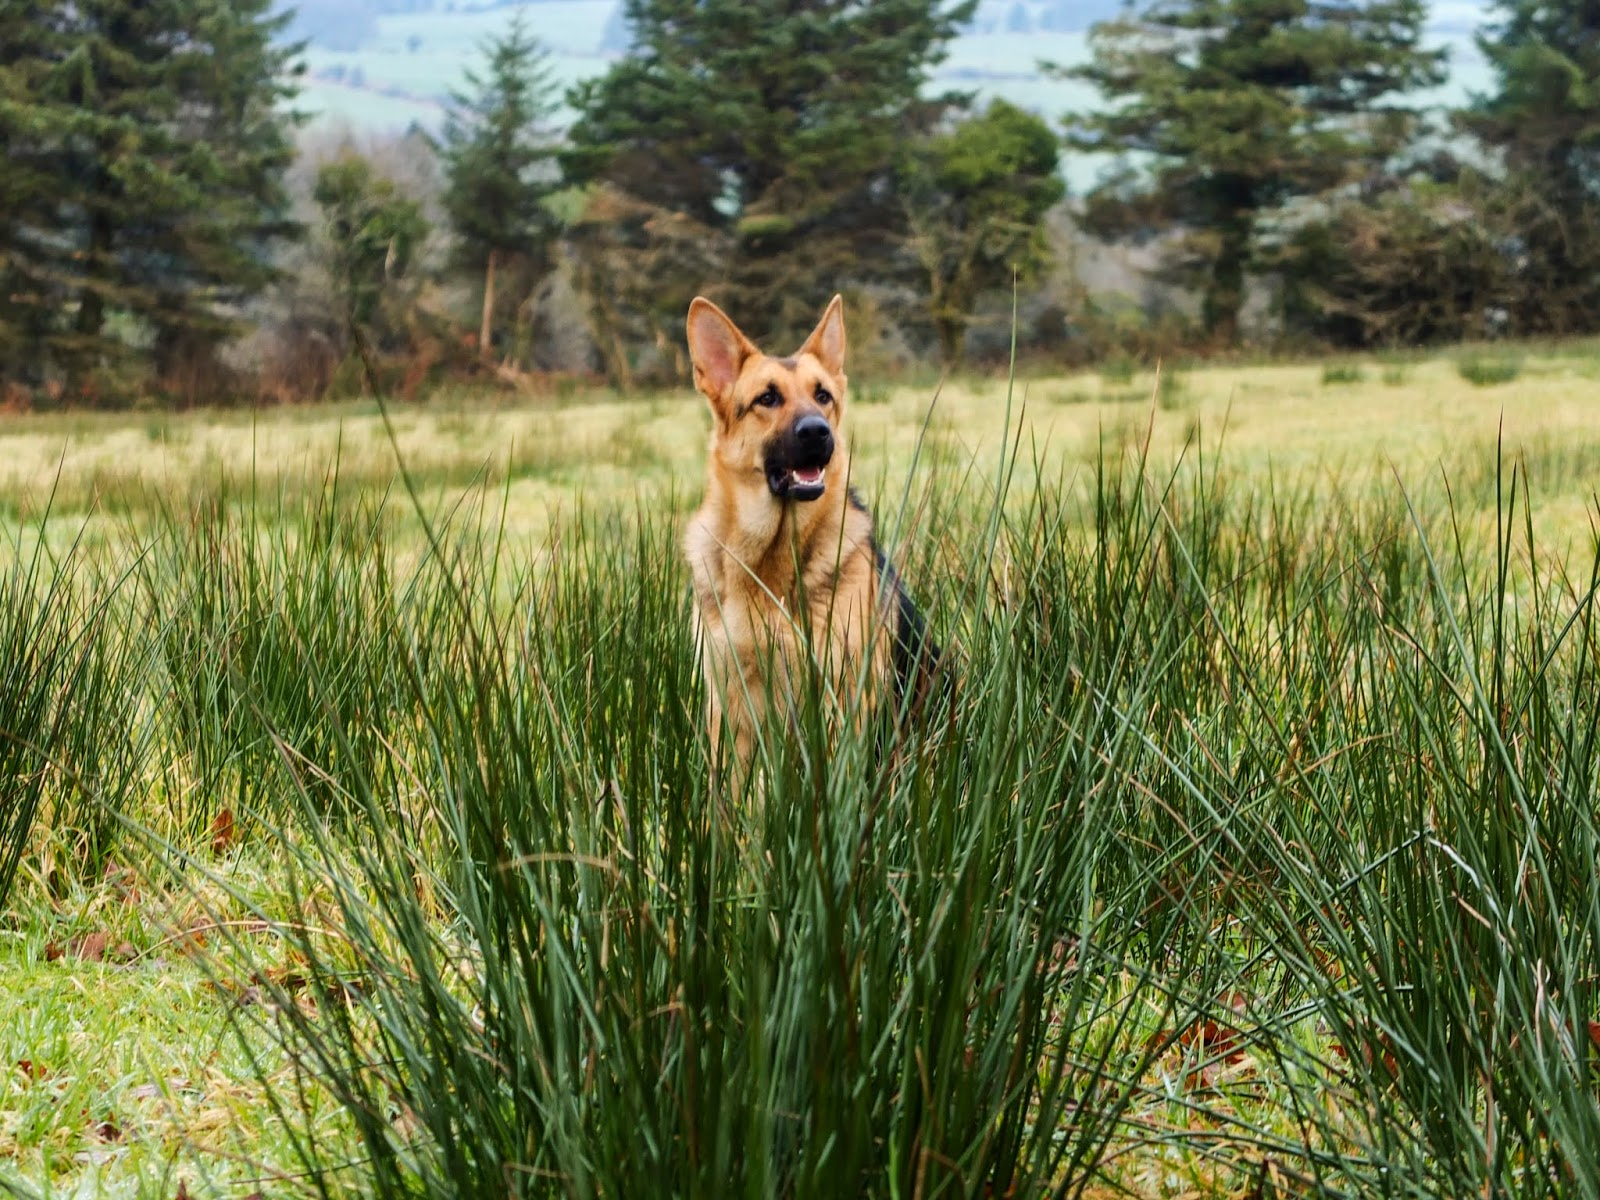 German Shepherd Nala sitting among tall grasses in a field.